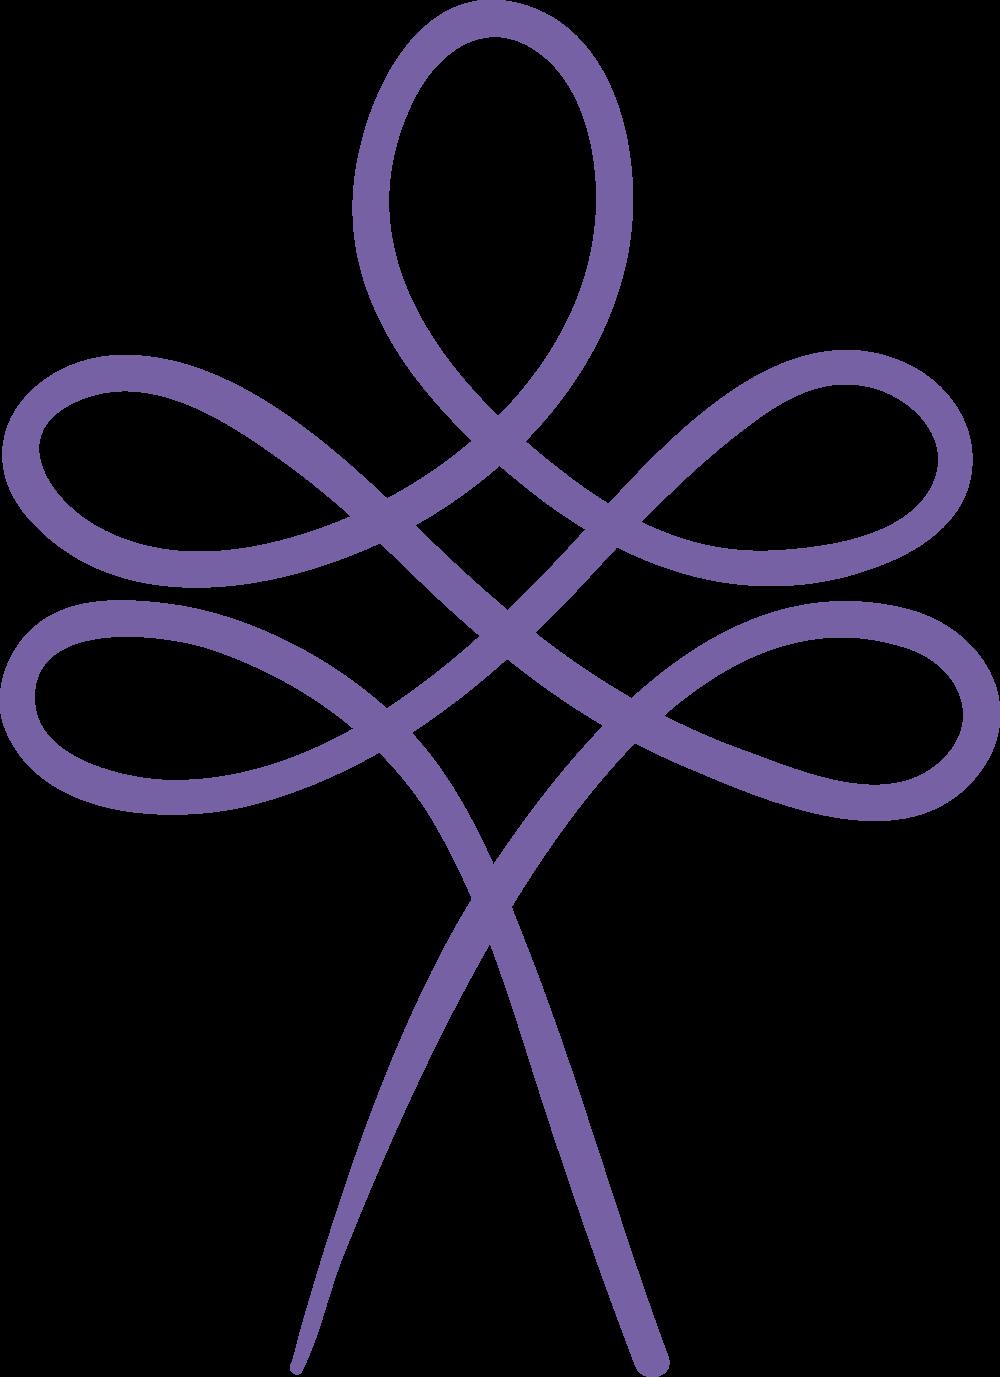 logo-symbol-ora-lee-smith-cancer-research-foundation-2-0-lavender